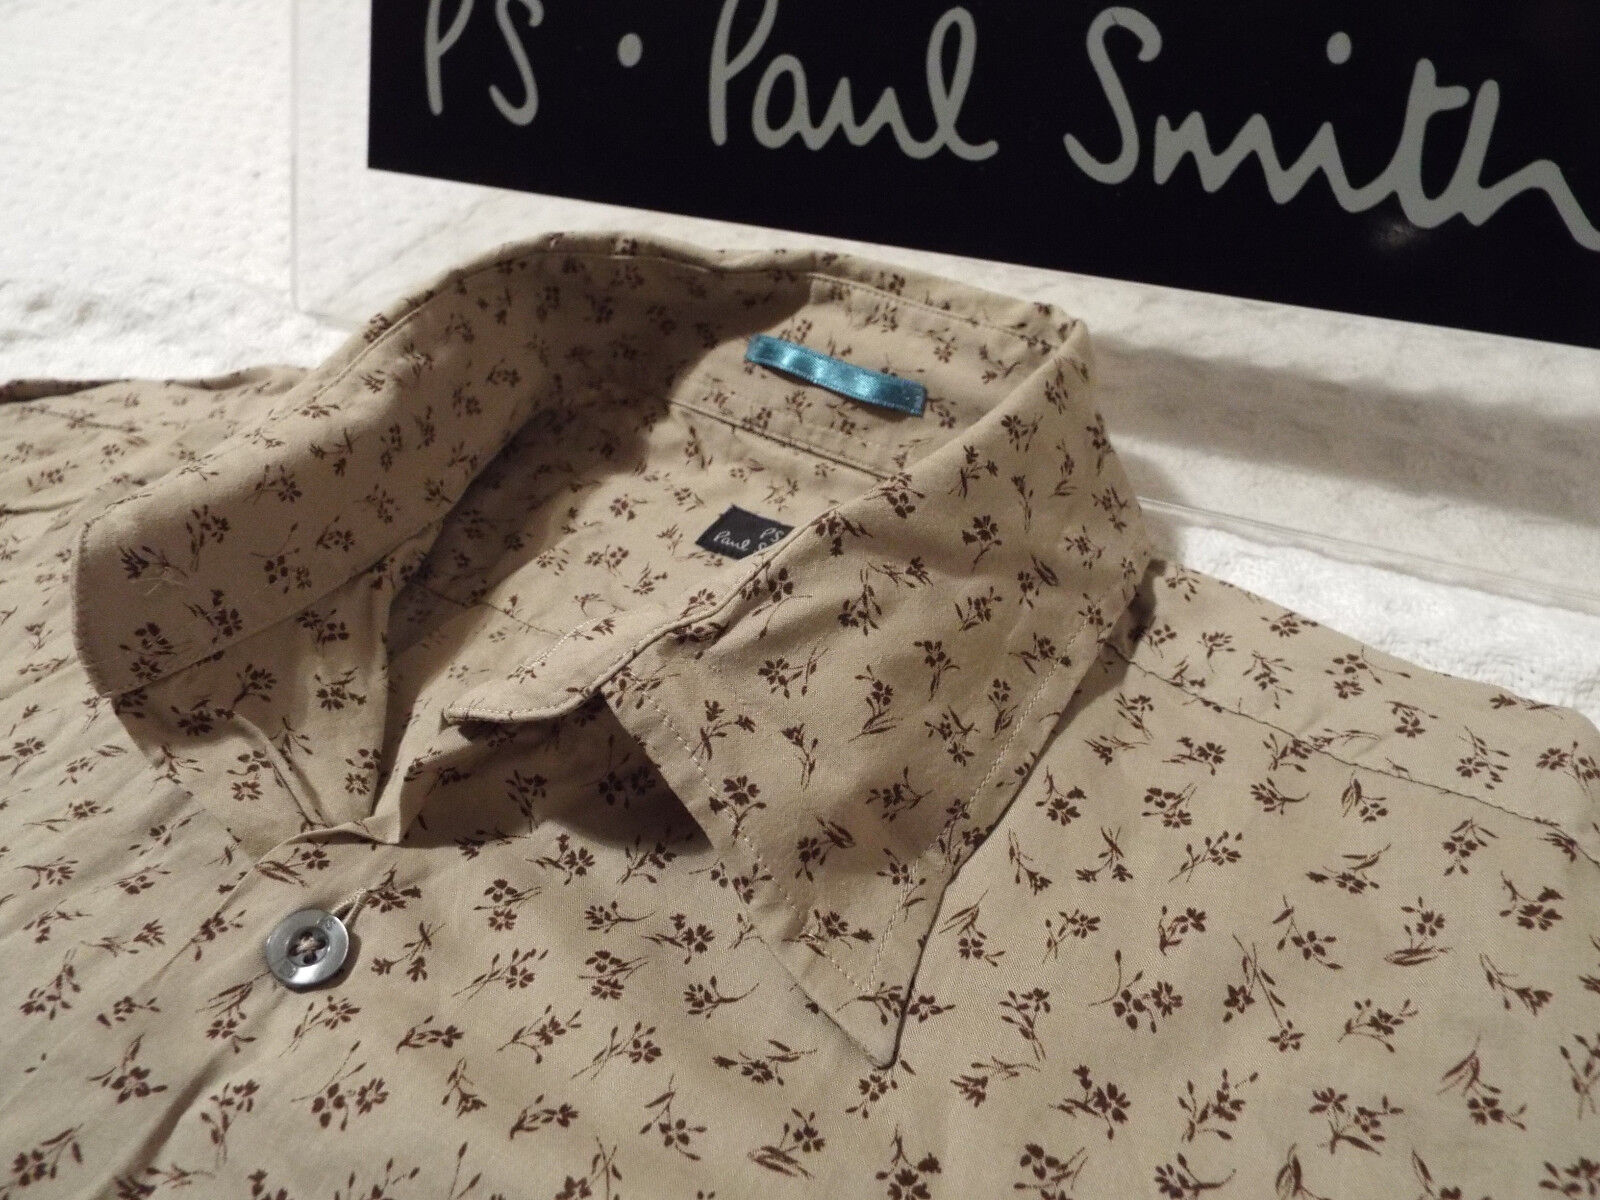 PAUL SMITH Mens Shirt  Größe M (CHEST 40 40 40 )   +  FLORAL LIBERTY STYLE    Neuheit Spielzeug  2bfeb1